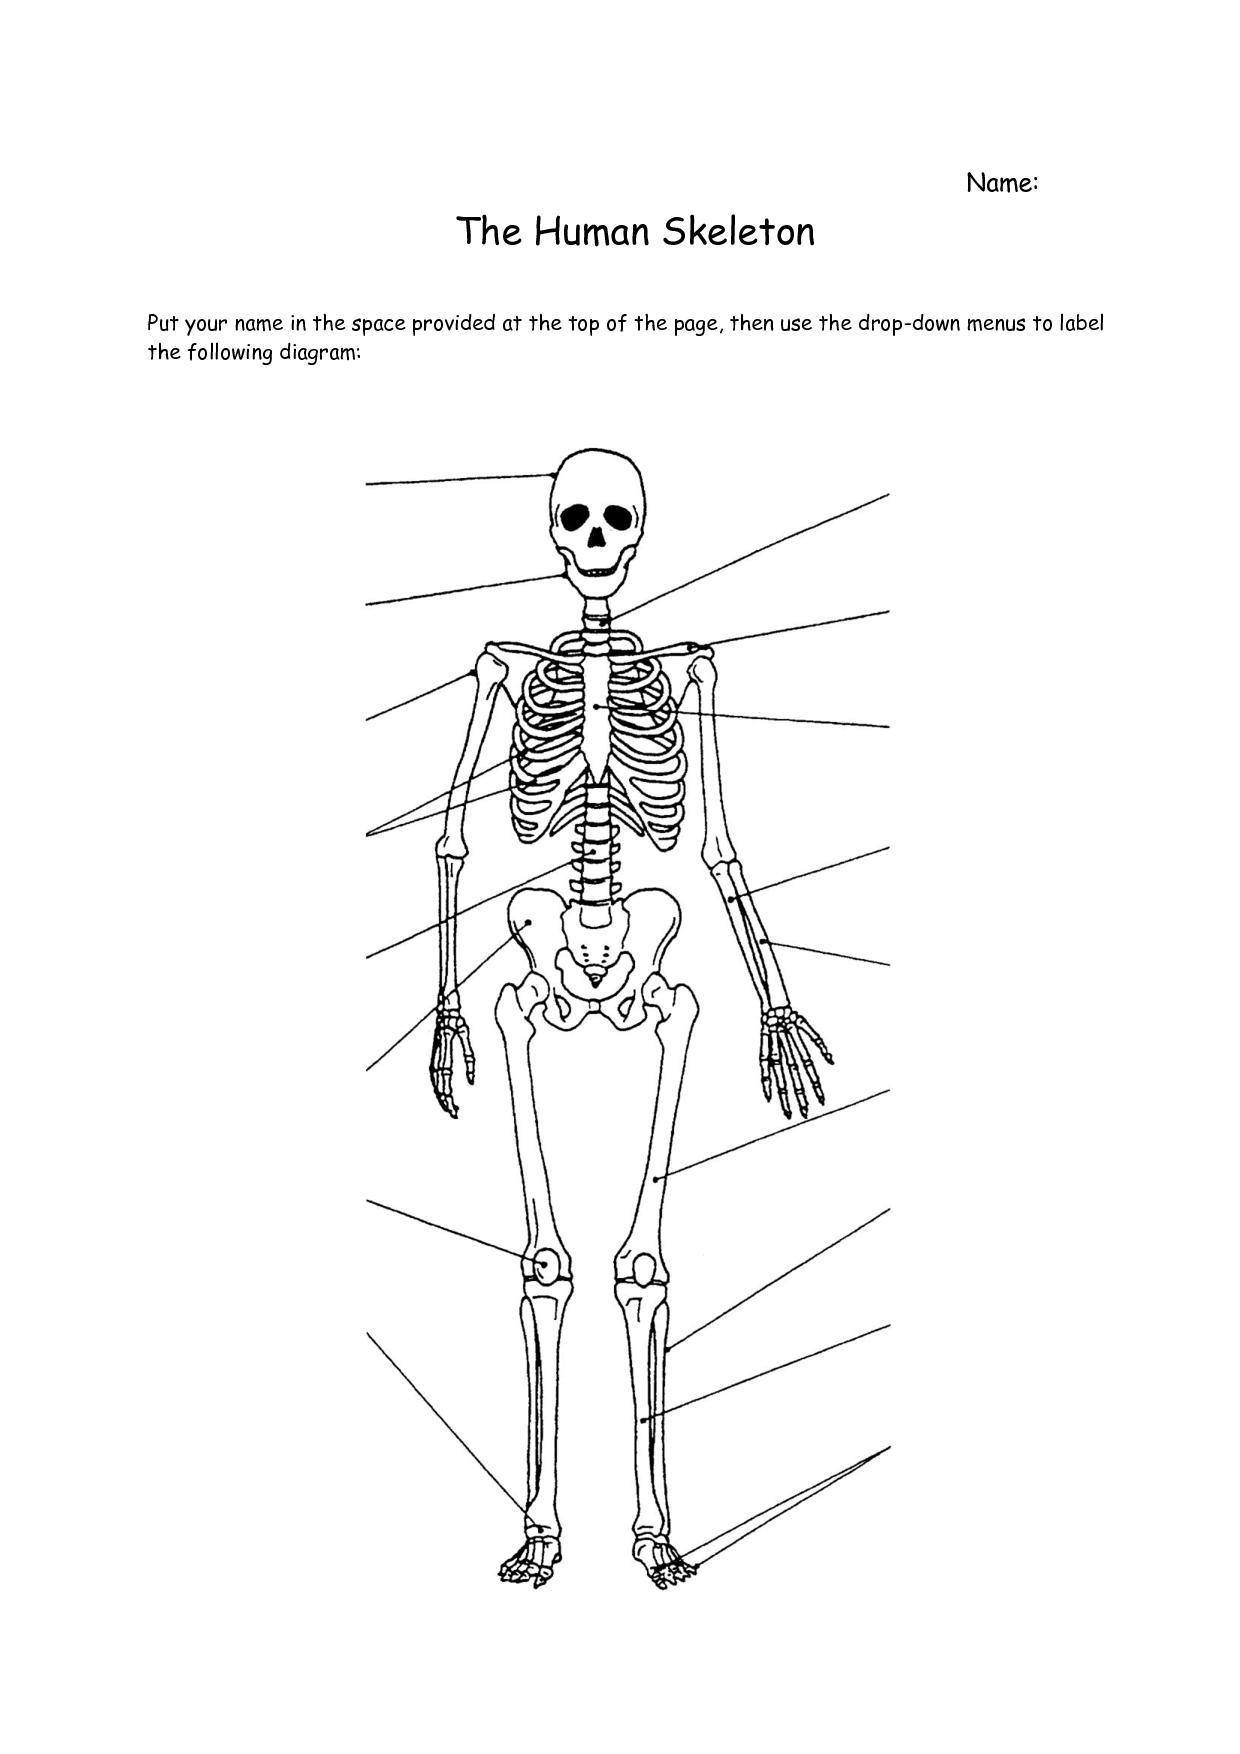 anatomy coloring book chapter 13 answers skeletalsystemevidencesheetanswerkey 3 0 anatomy 8 anatomy chapter book 13 answers coloring